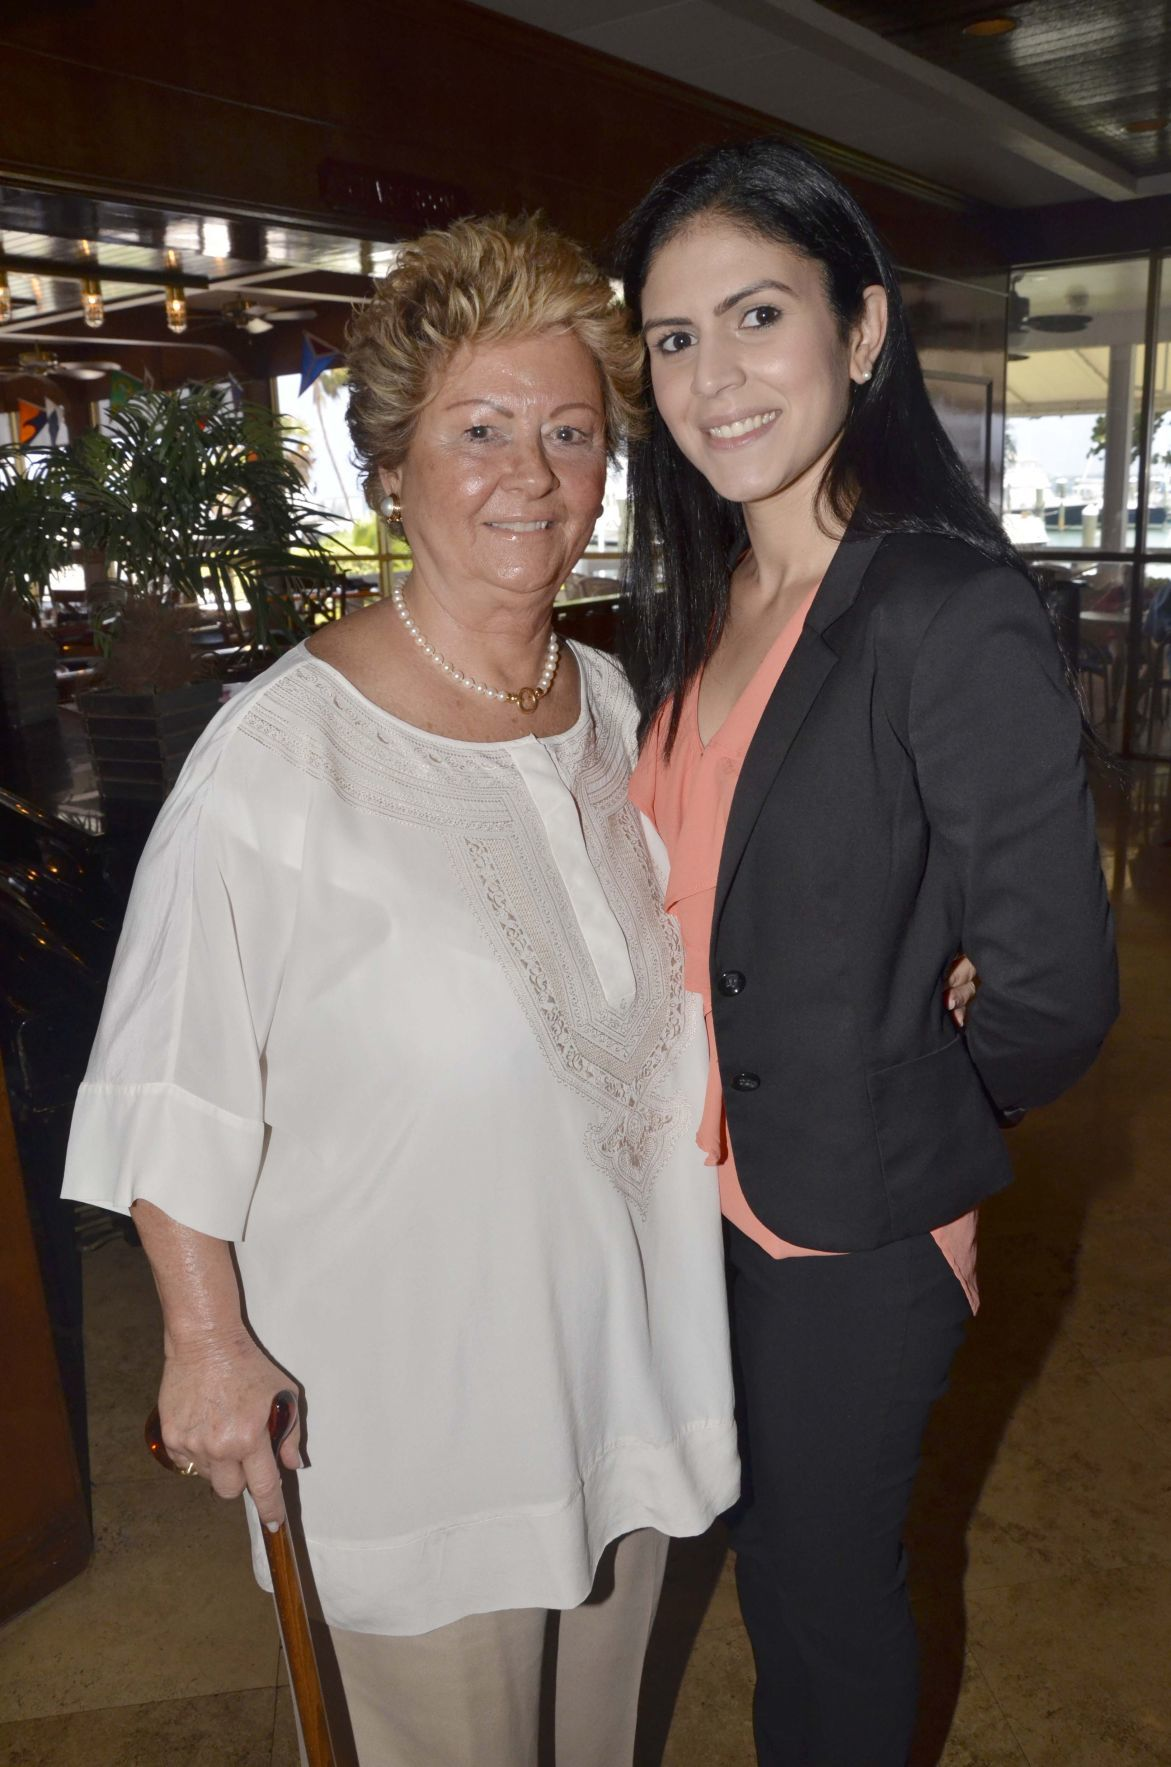 Jennifer Media and interim and former Village Clerk Conchita Alvarez